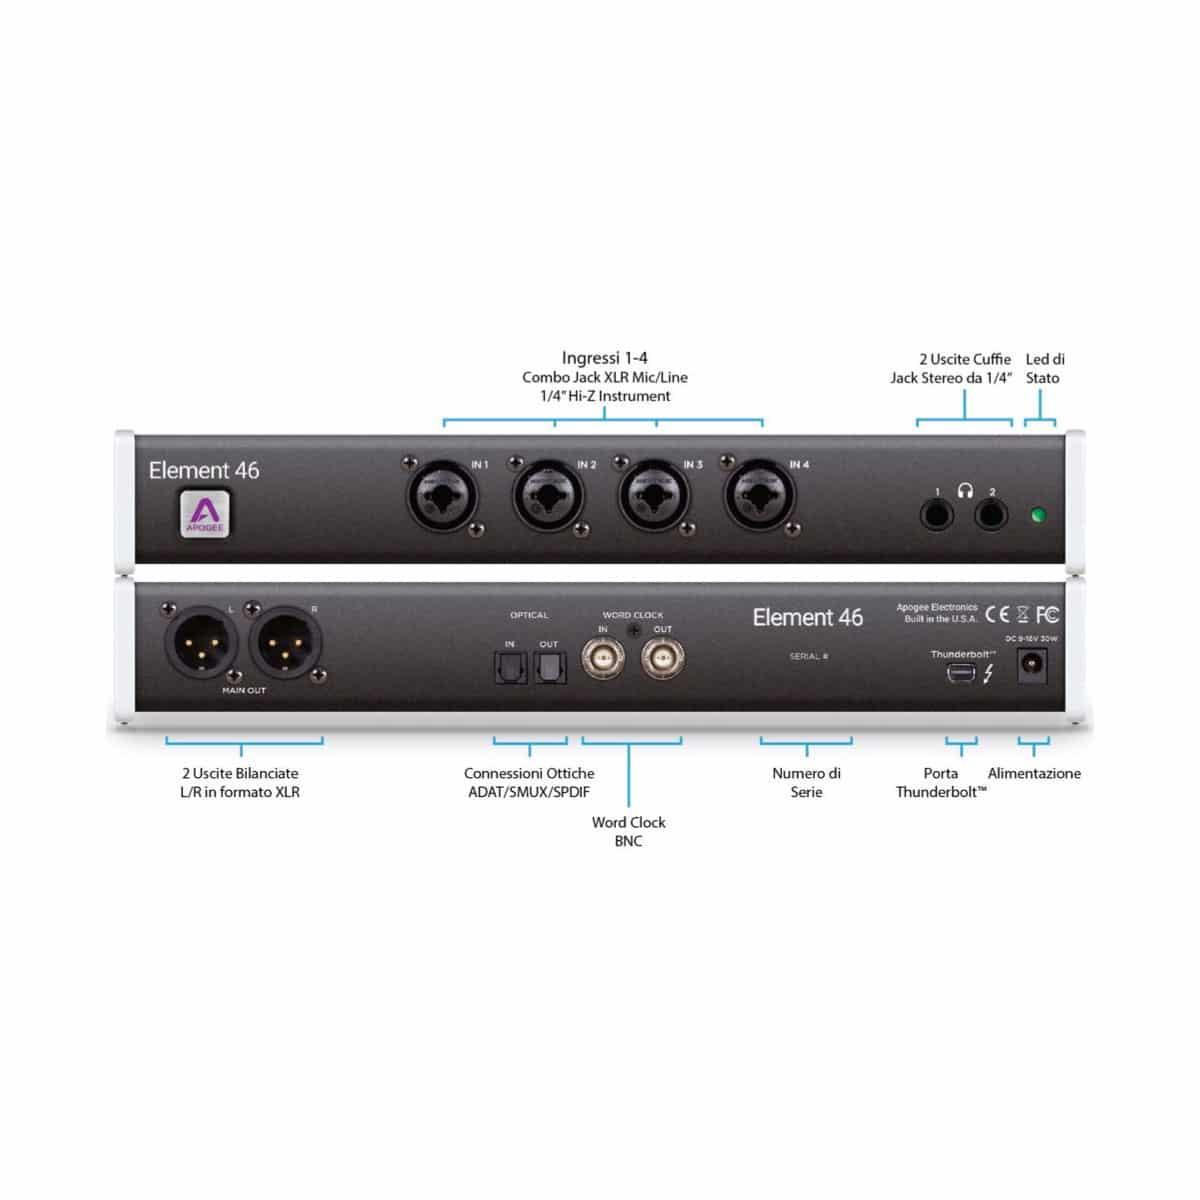 Apogee Element 46 041 Pro Audio, Audio Digitale, Schede Audio per PC e MAC